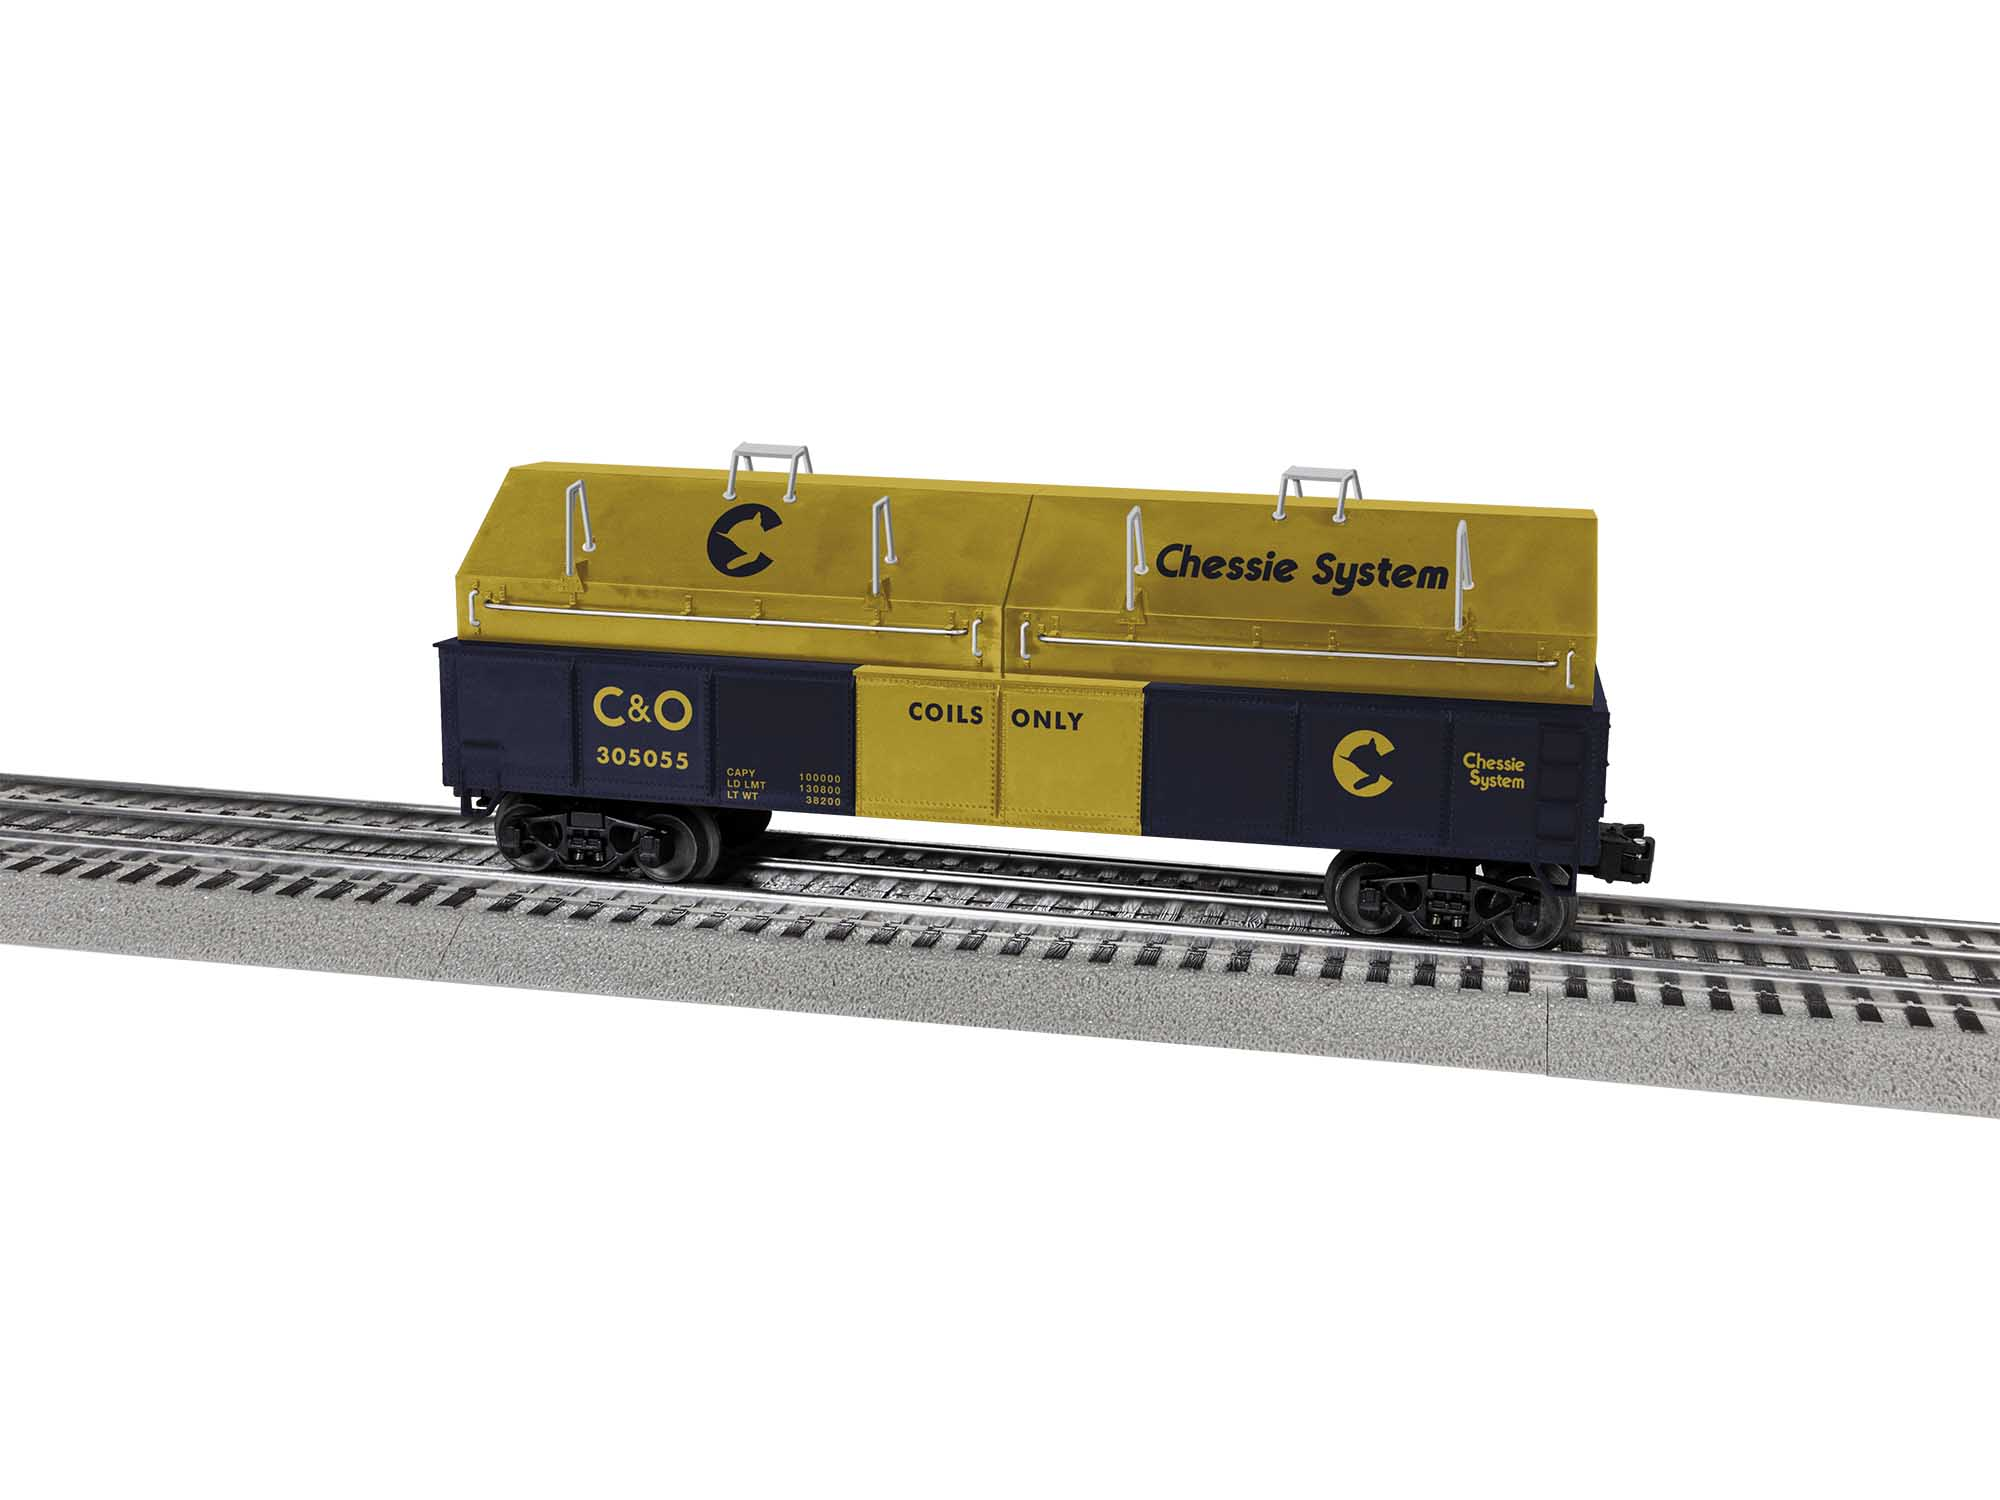 Lionel 2043144 O Gondola Chessie System #305055